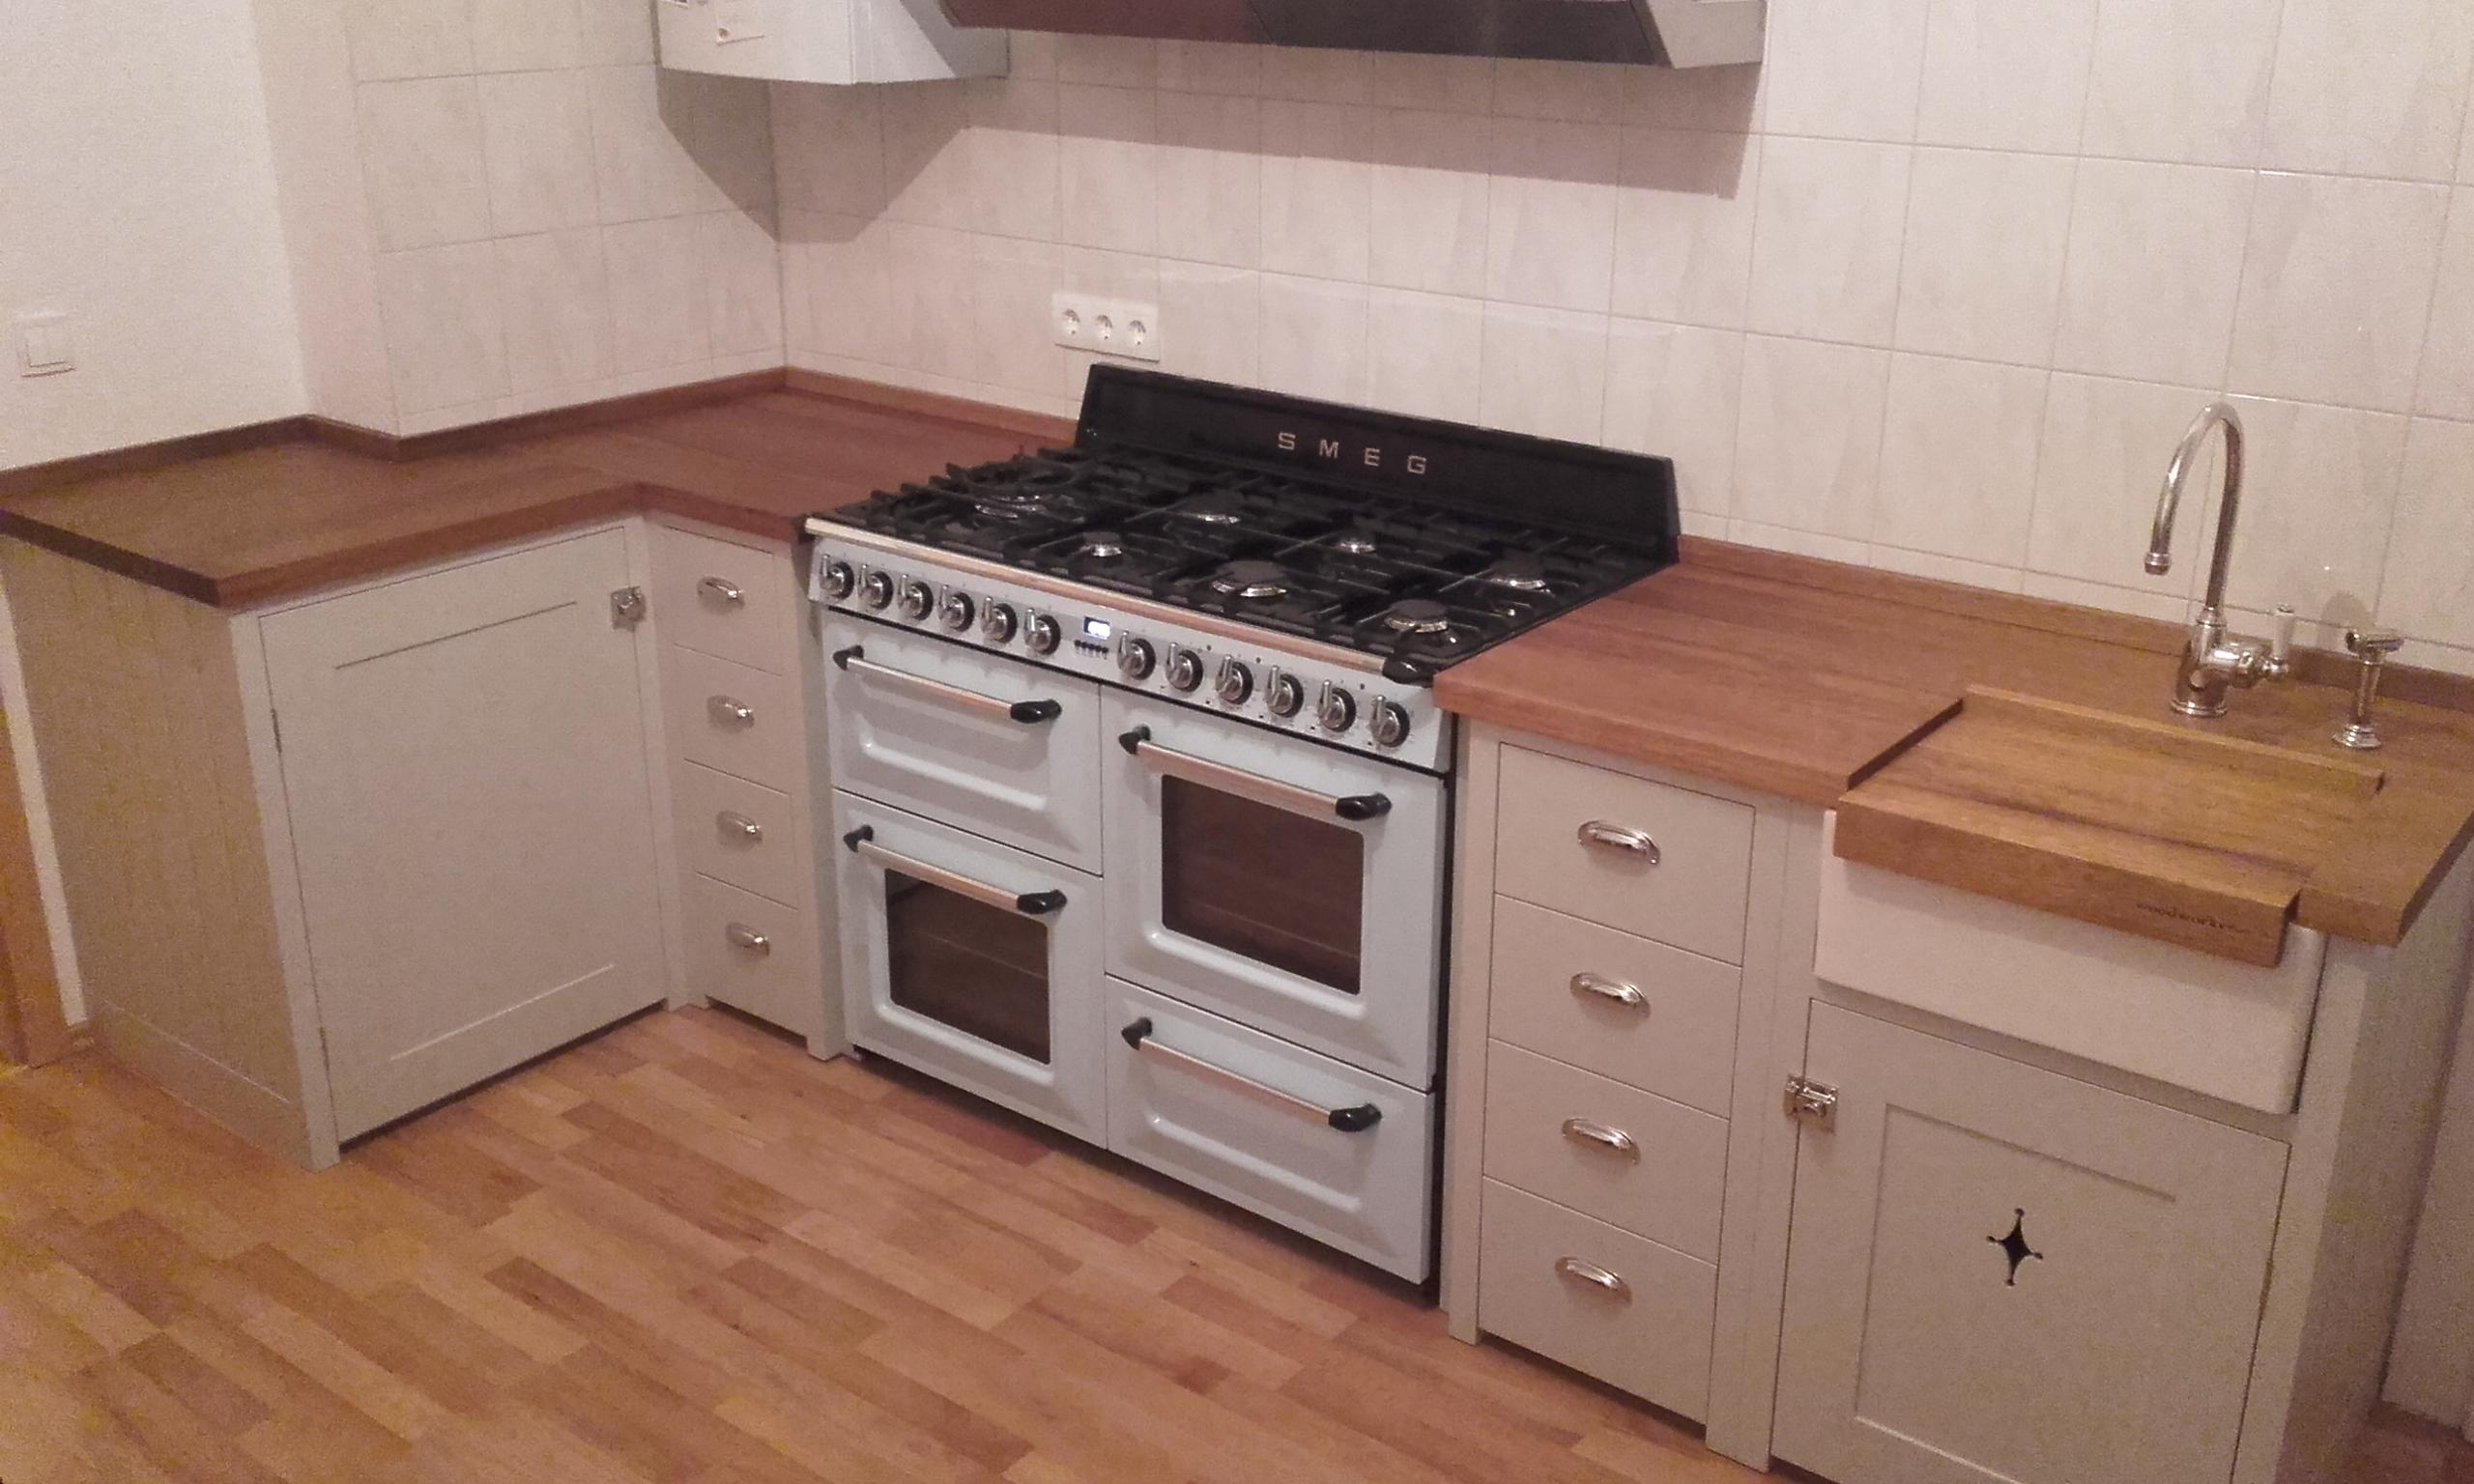 Foto: Küche - Shaker Stil - Rennrad-News.de